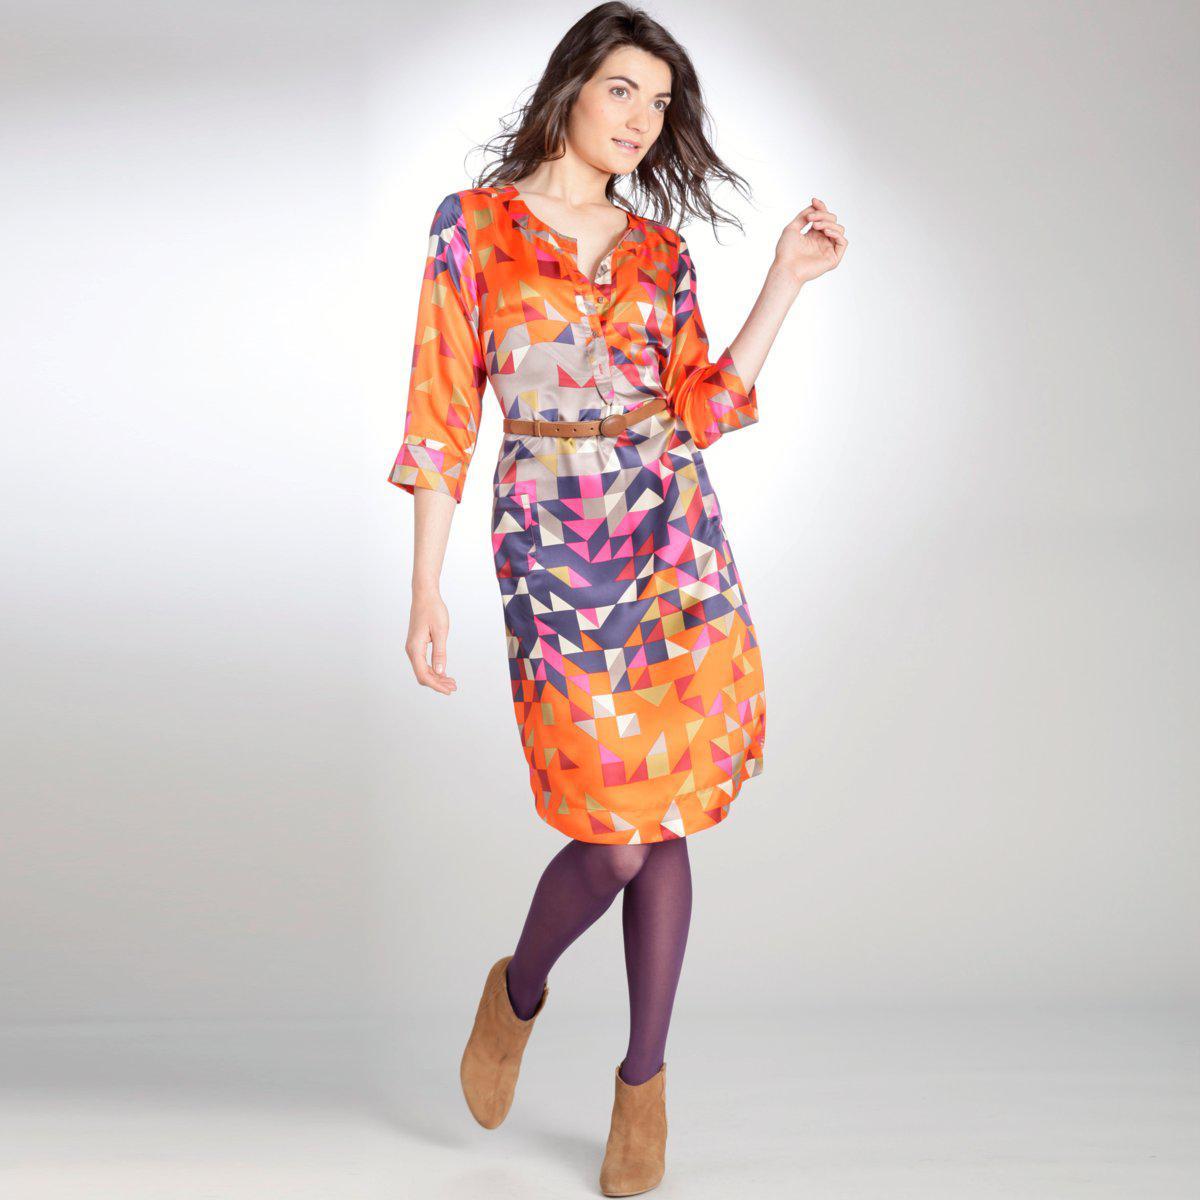 bradyna foremata 242 - Βραδυνα Φορεματα LaRedoute Φθινόπωρο 2011 Κωδ. 324213050